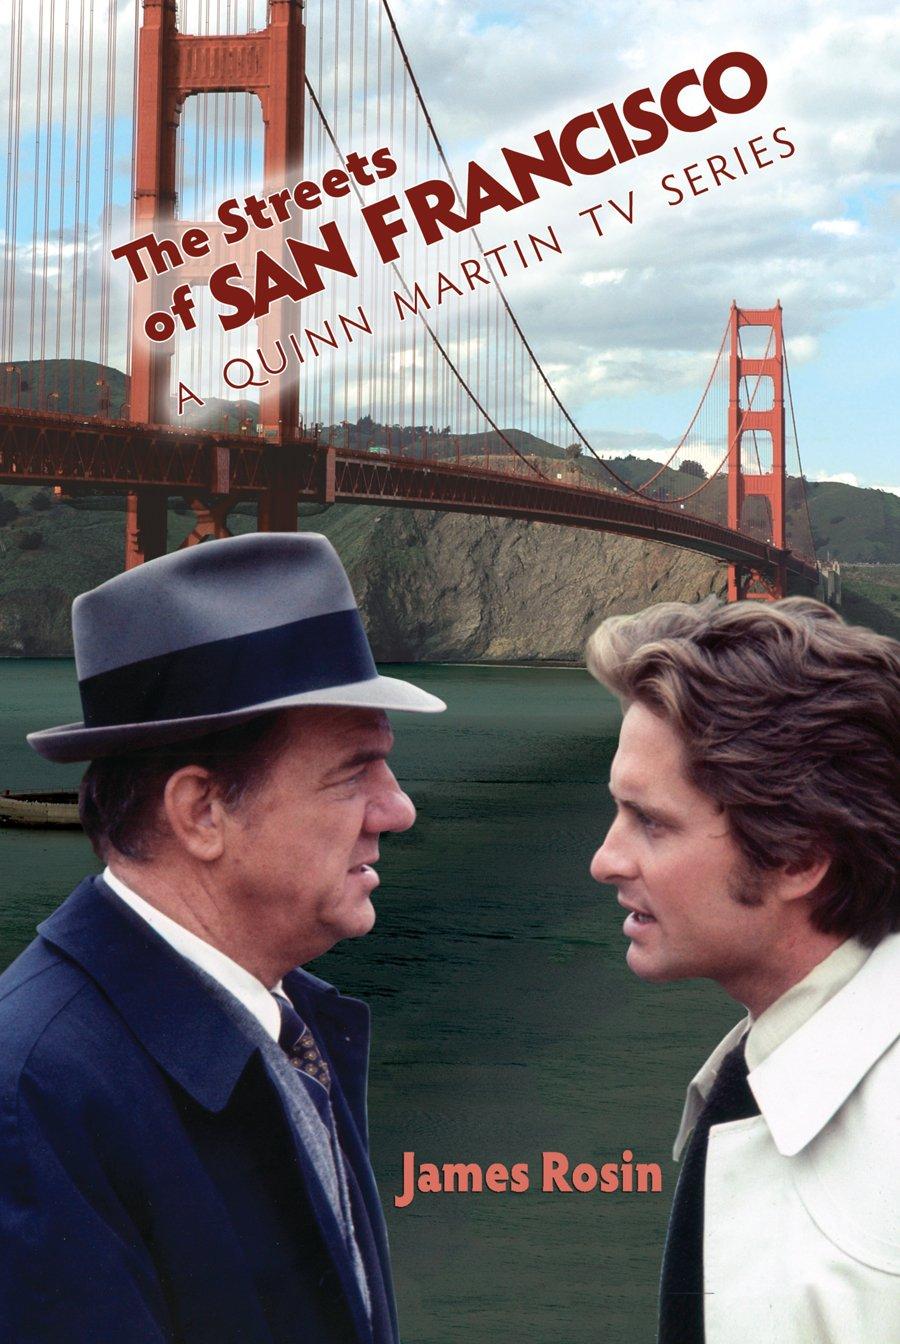 The Streets of San Francisco kapak